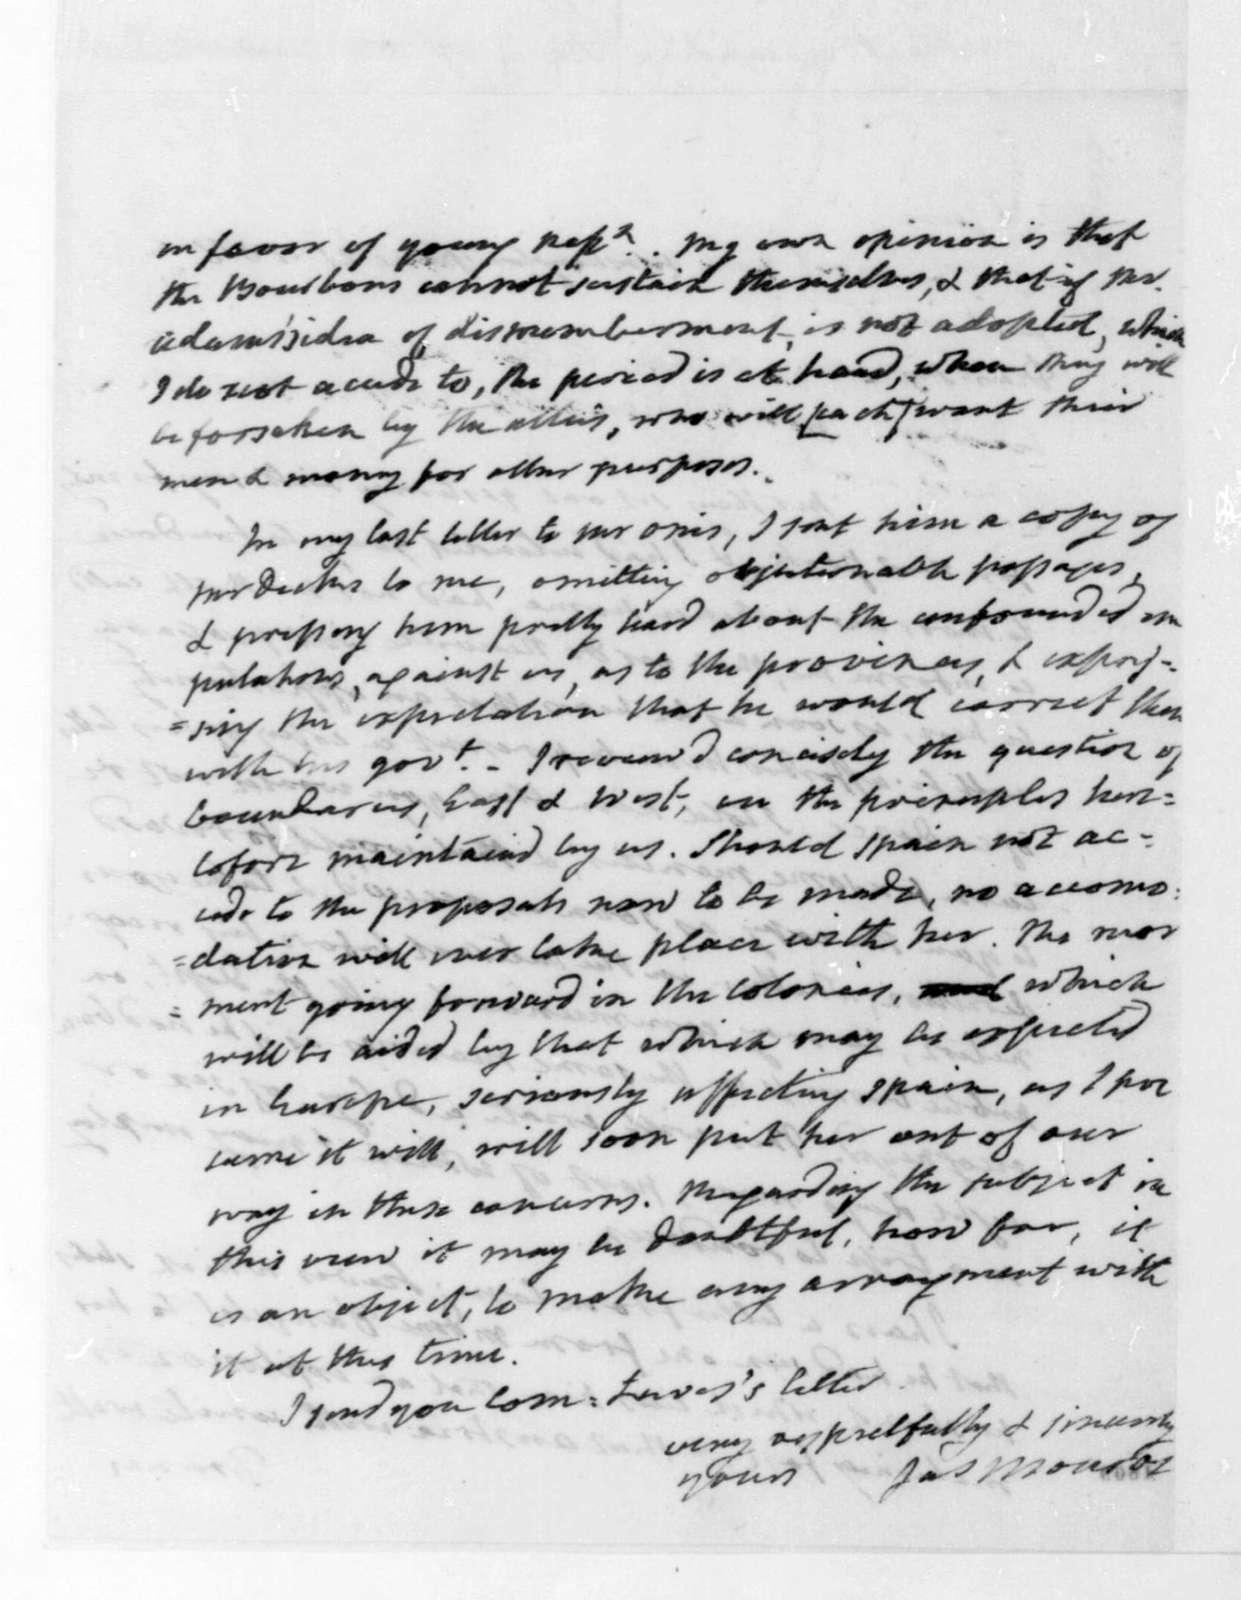 James Monroe to James Madison, June 21, 1816.